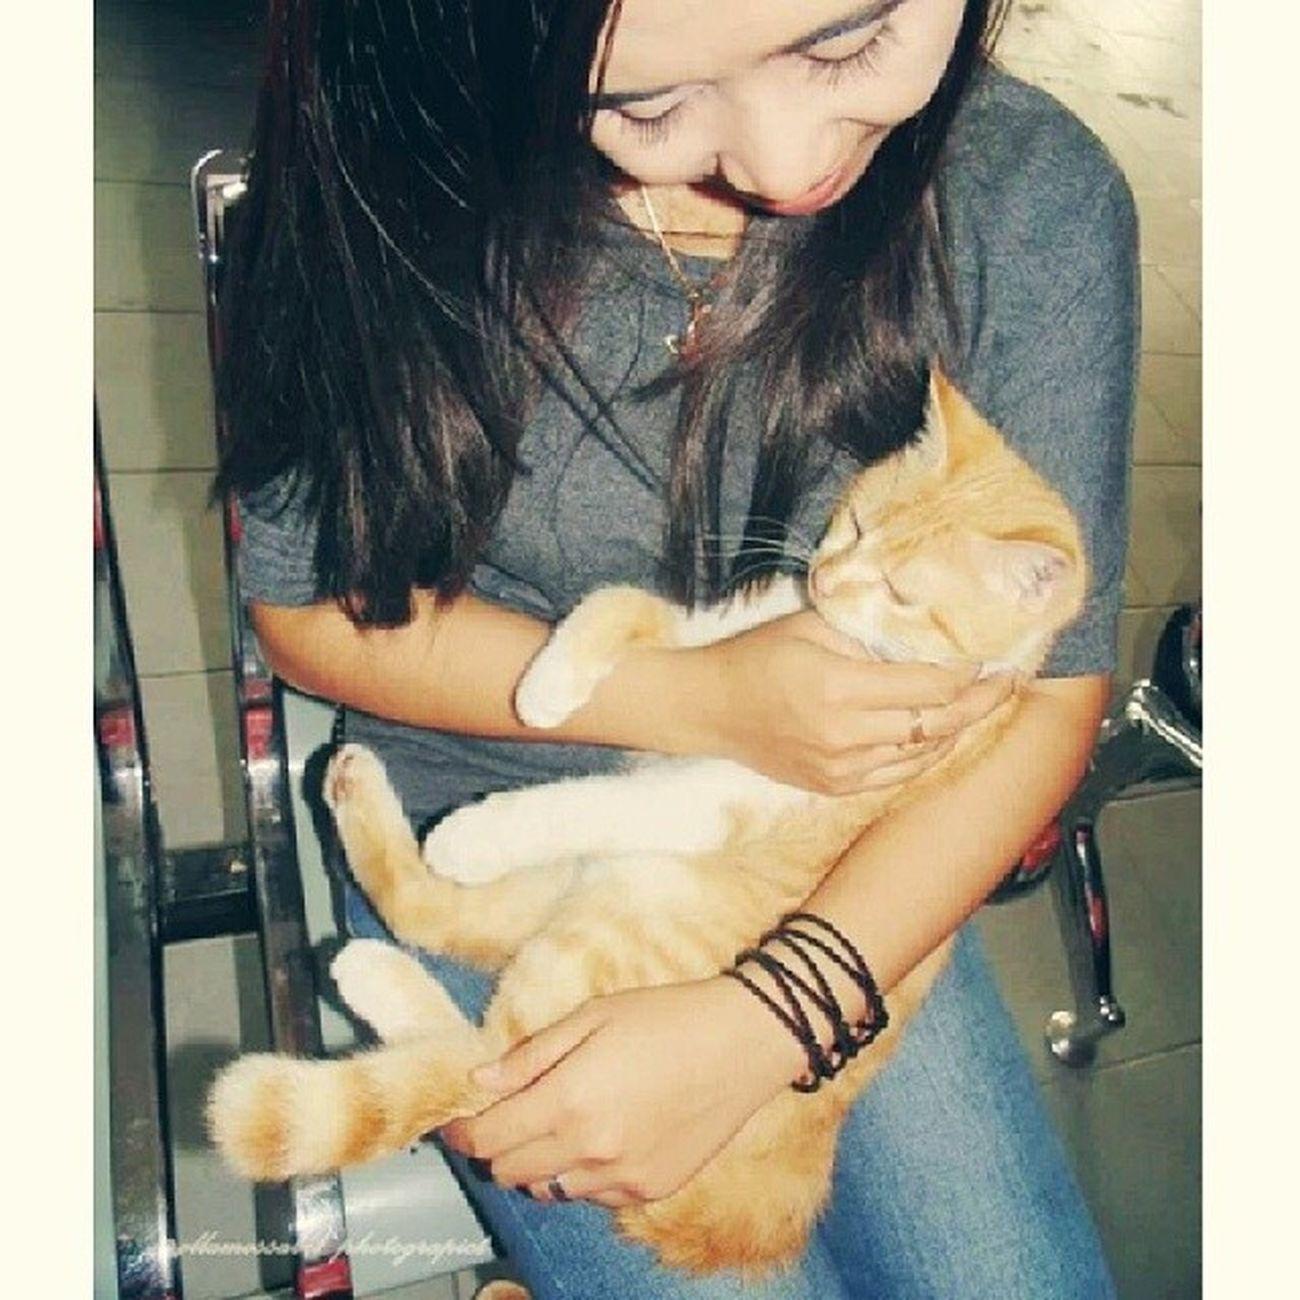 Me and Kucing penunggu Lapangan Tembak PERBAKIN kalimantantengah ~ … ntah siapalah nama ni kucing tapi sumpeeehh ini cuma kucing kampung yang mirip banget sama kucing anggora … aslinya tu badan gede bingittt and bulunya lebattt ~ … molome